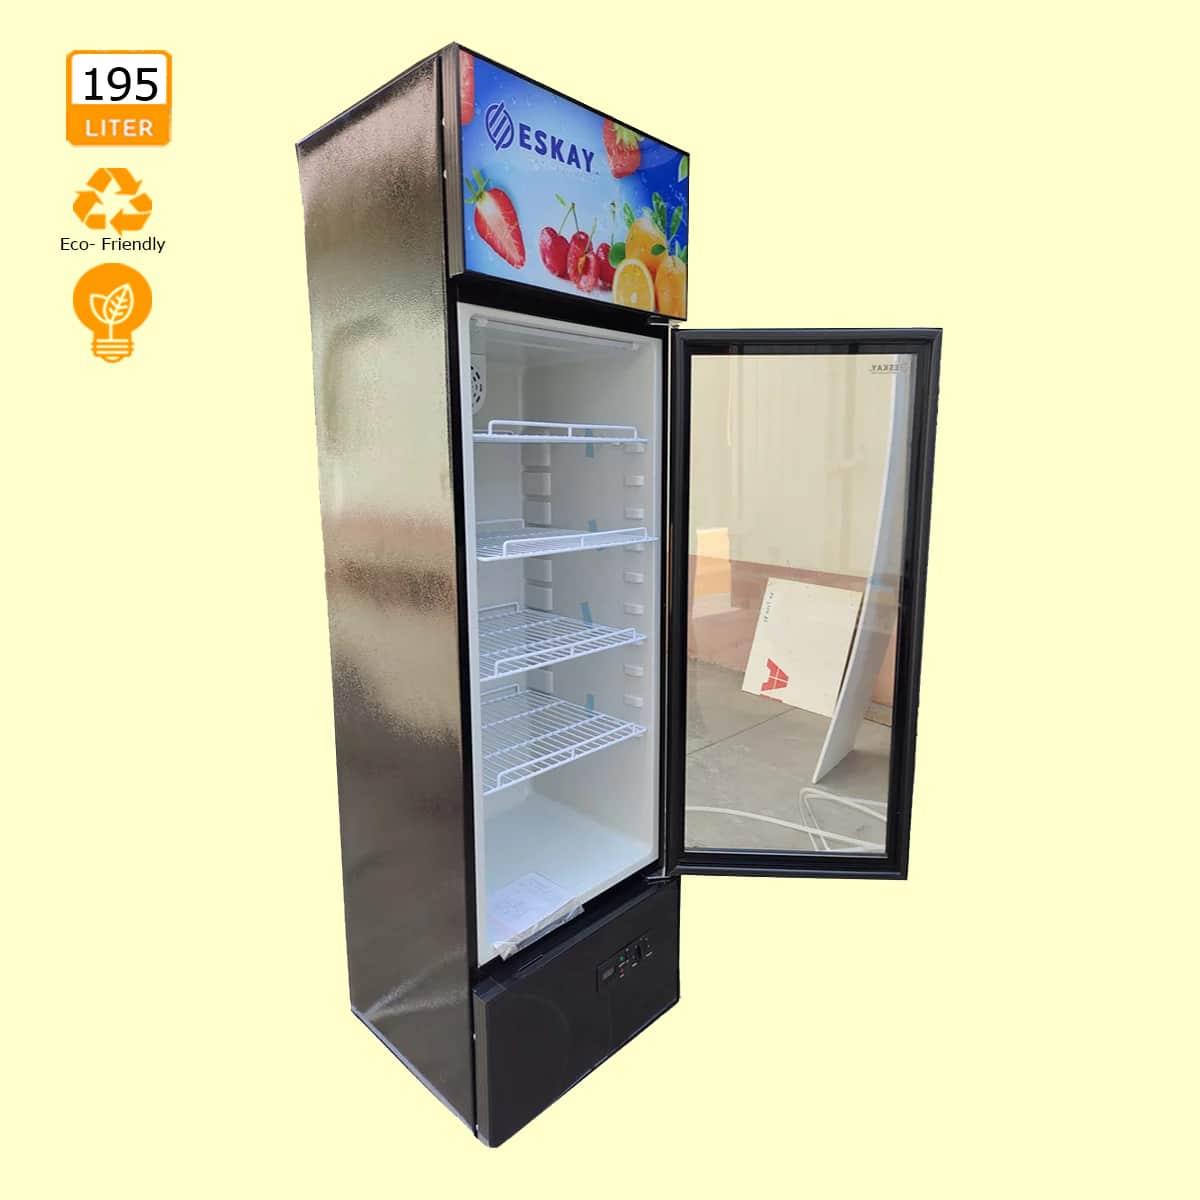 eskay-display-fridge195